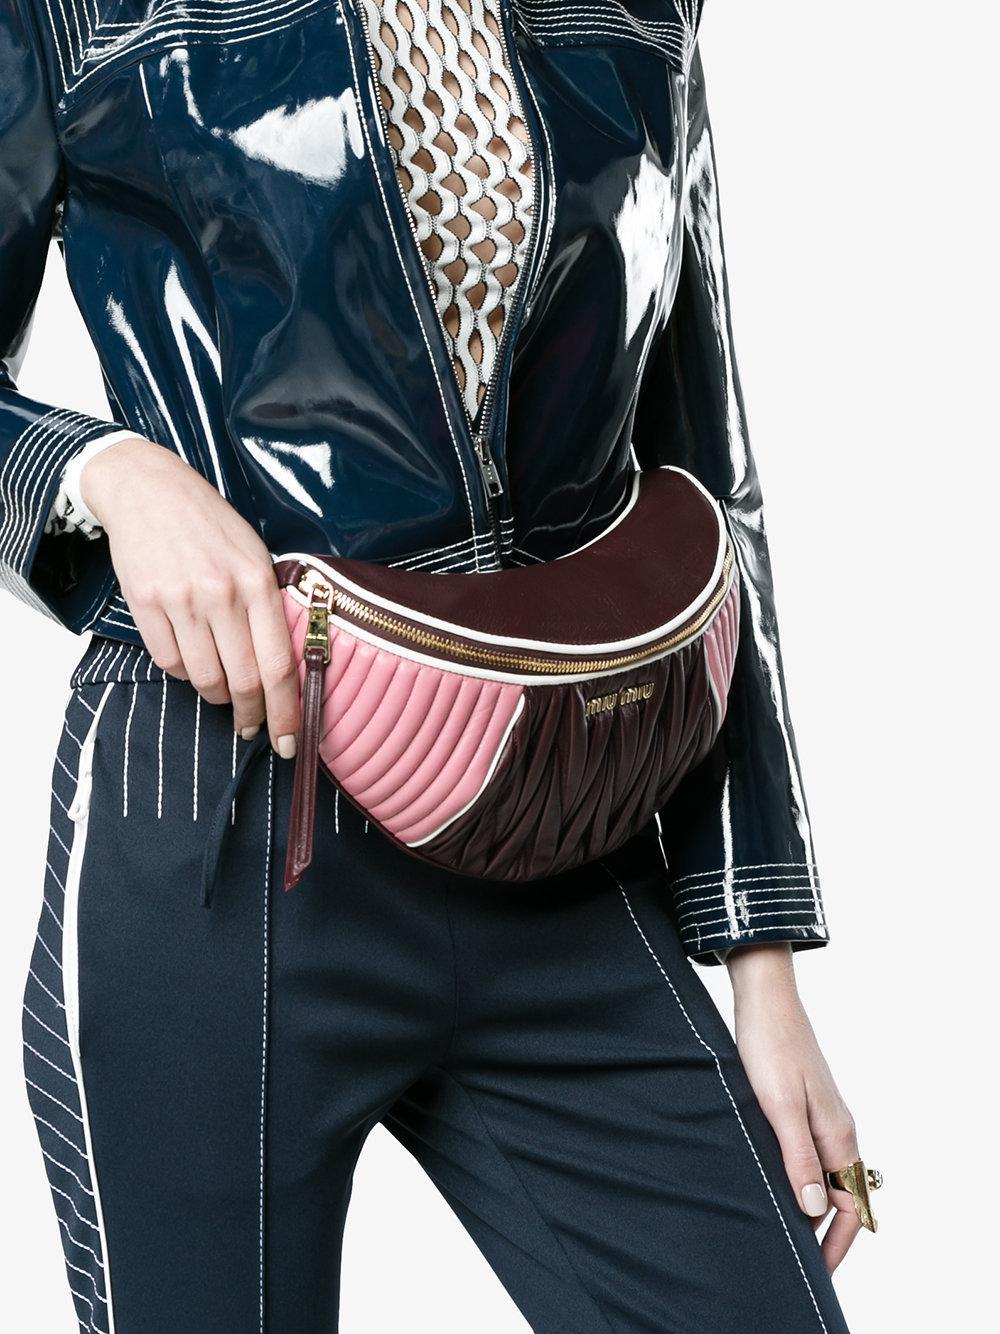 150efedf8759 Gallery. Previously sold at: Browns · Women's Miu Miu Shoulder Bag